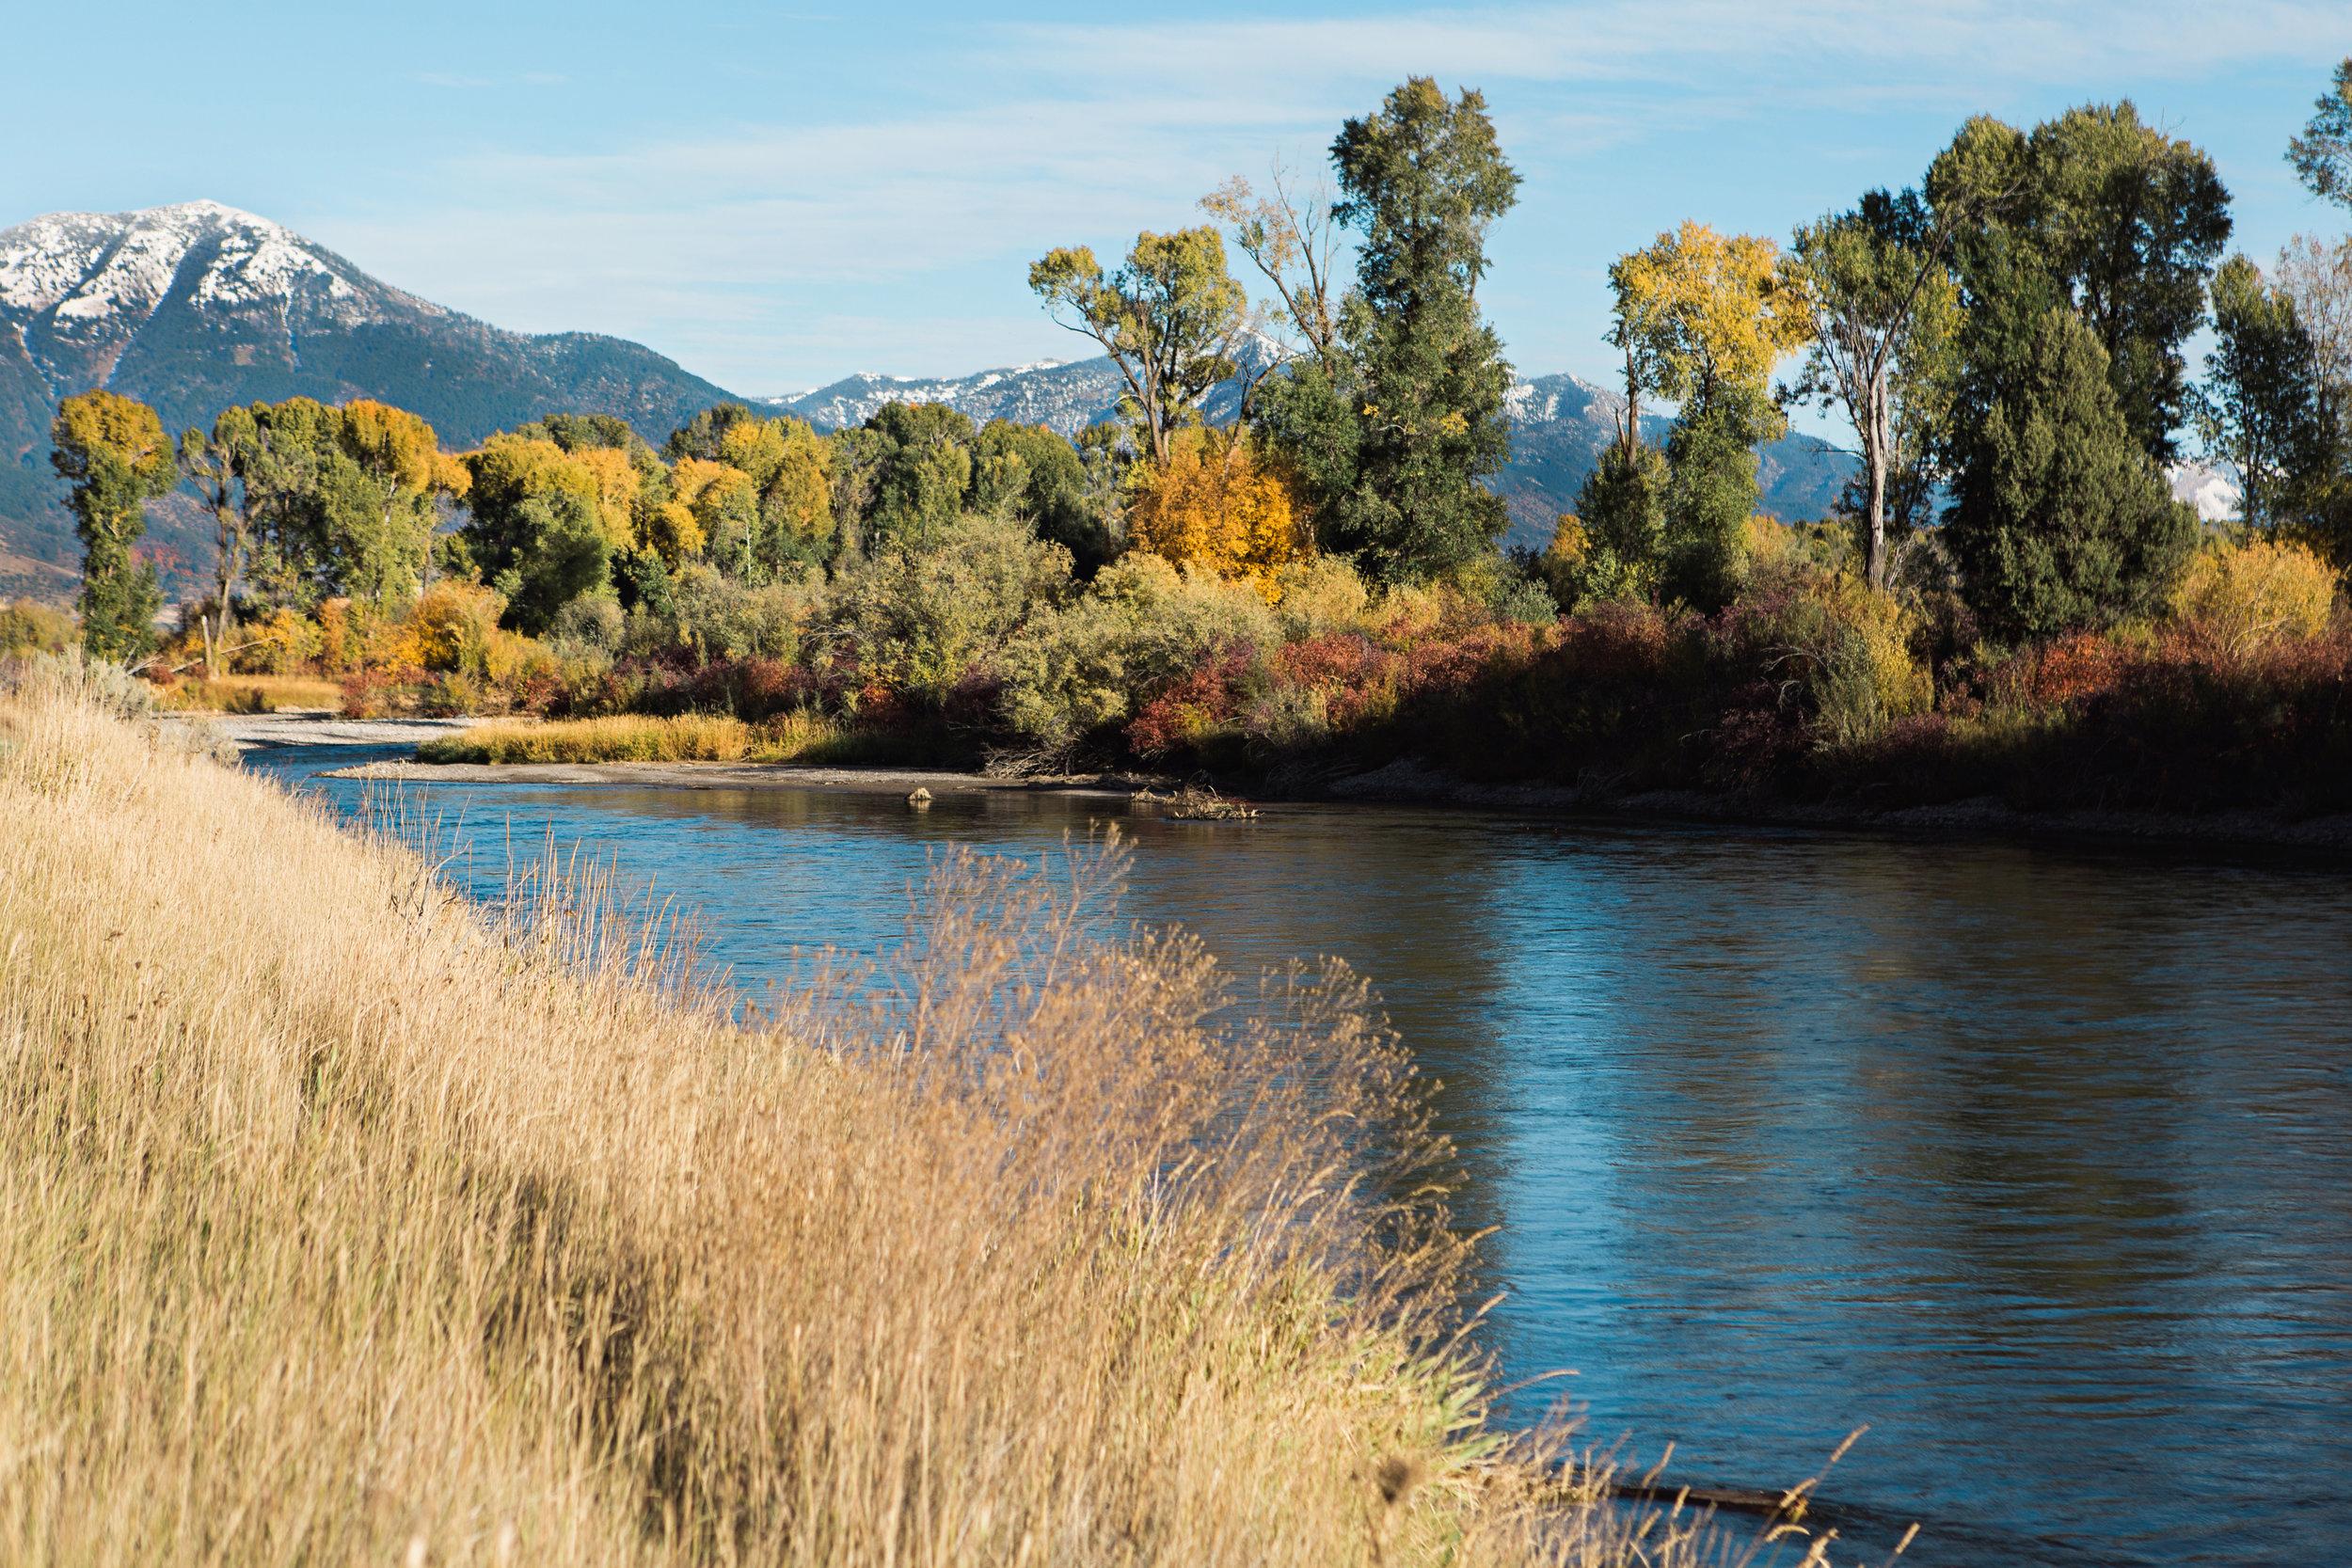 Cindy_Giovagnoli_Idaho_Wyoming_Grand_Teton_National_Park_autumn_aspens_camping_mountains-008.jpg